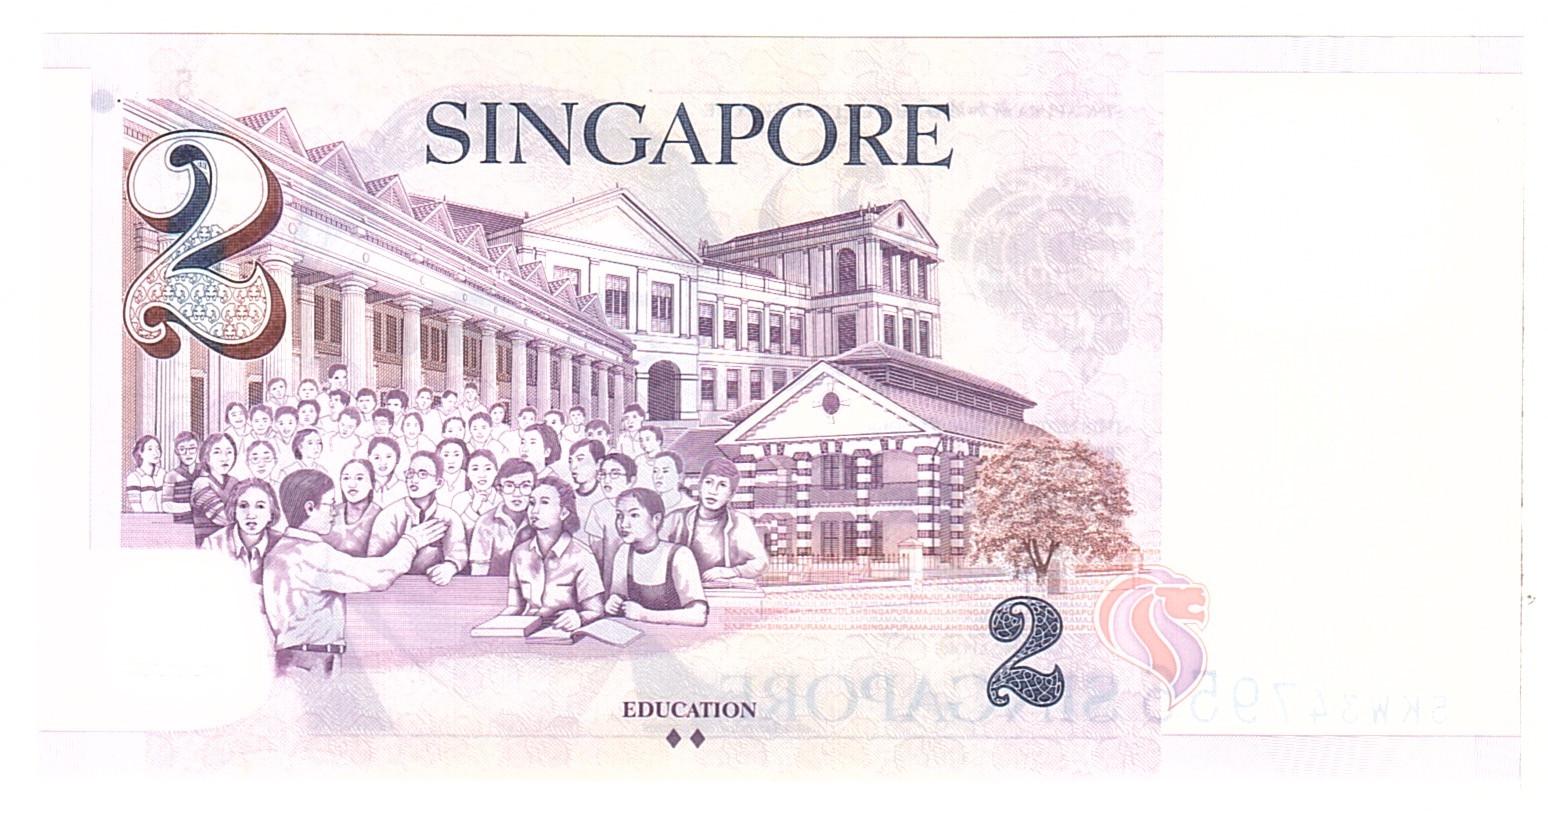 112573 singapore 2 dollars undated km 46 undated for Chambre de commerce singapore